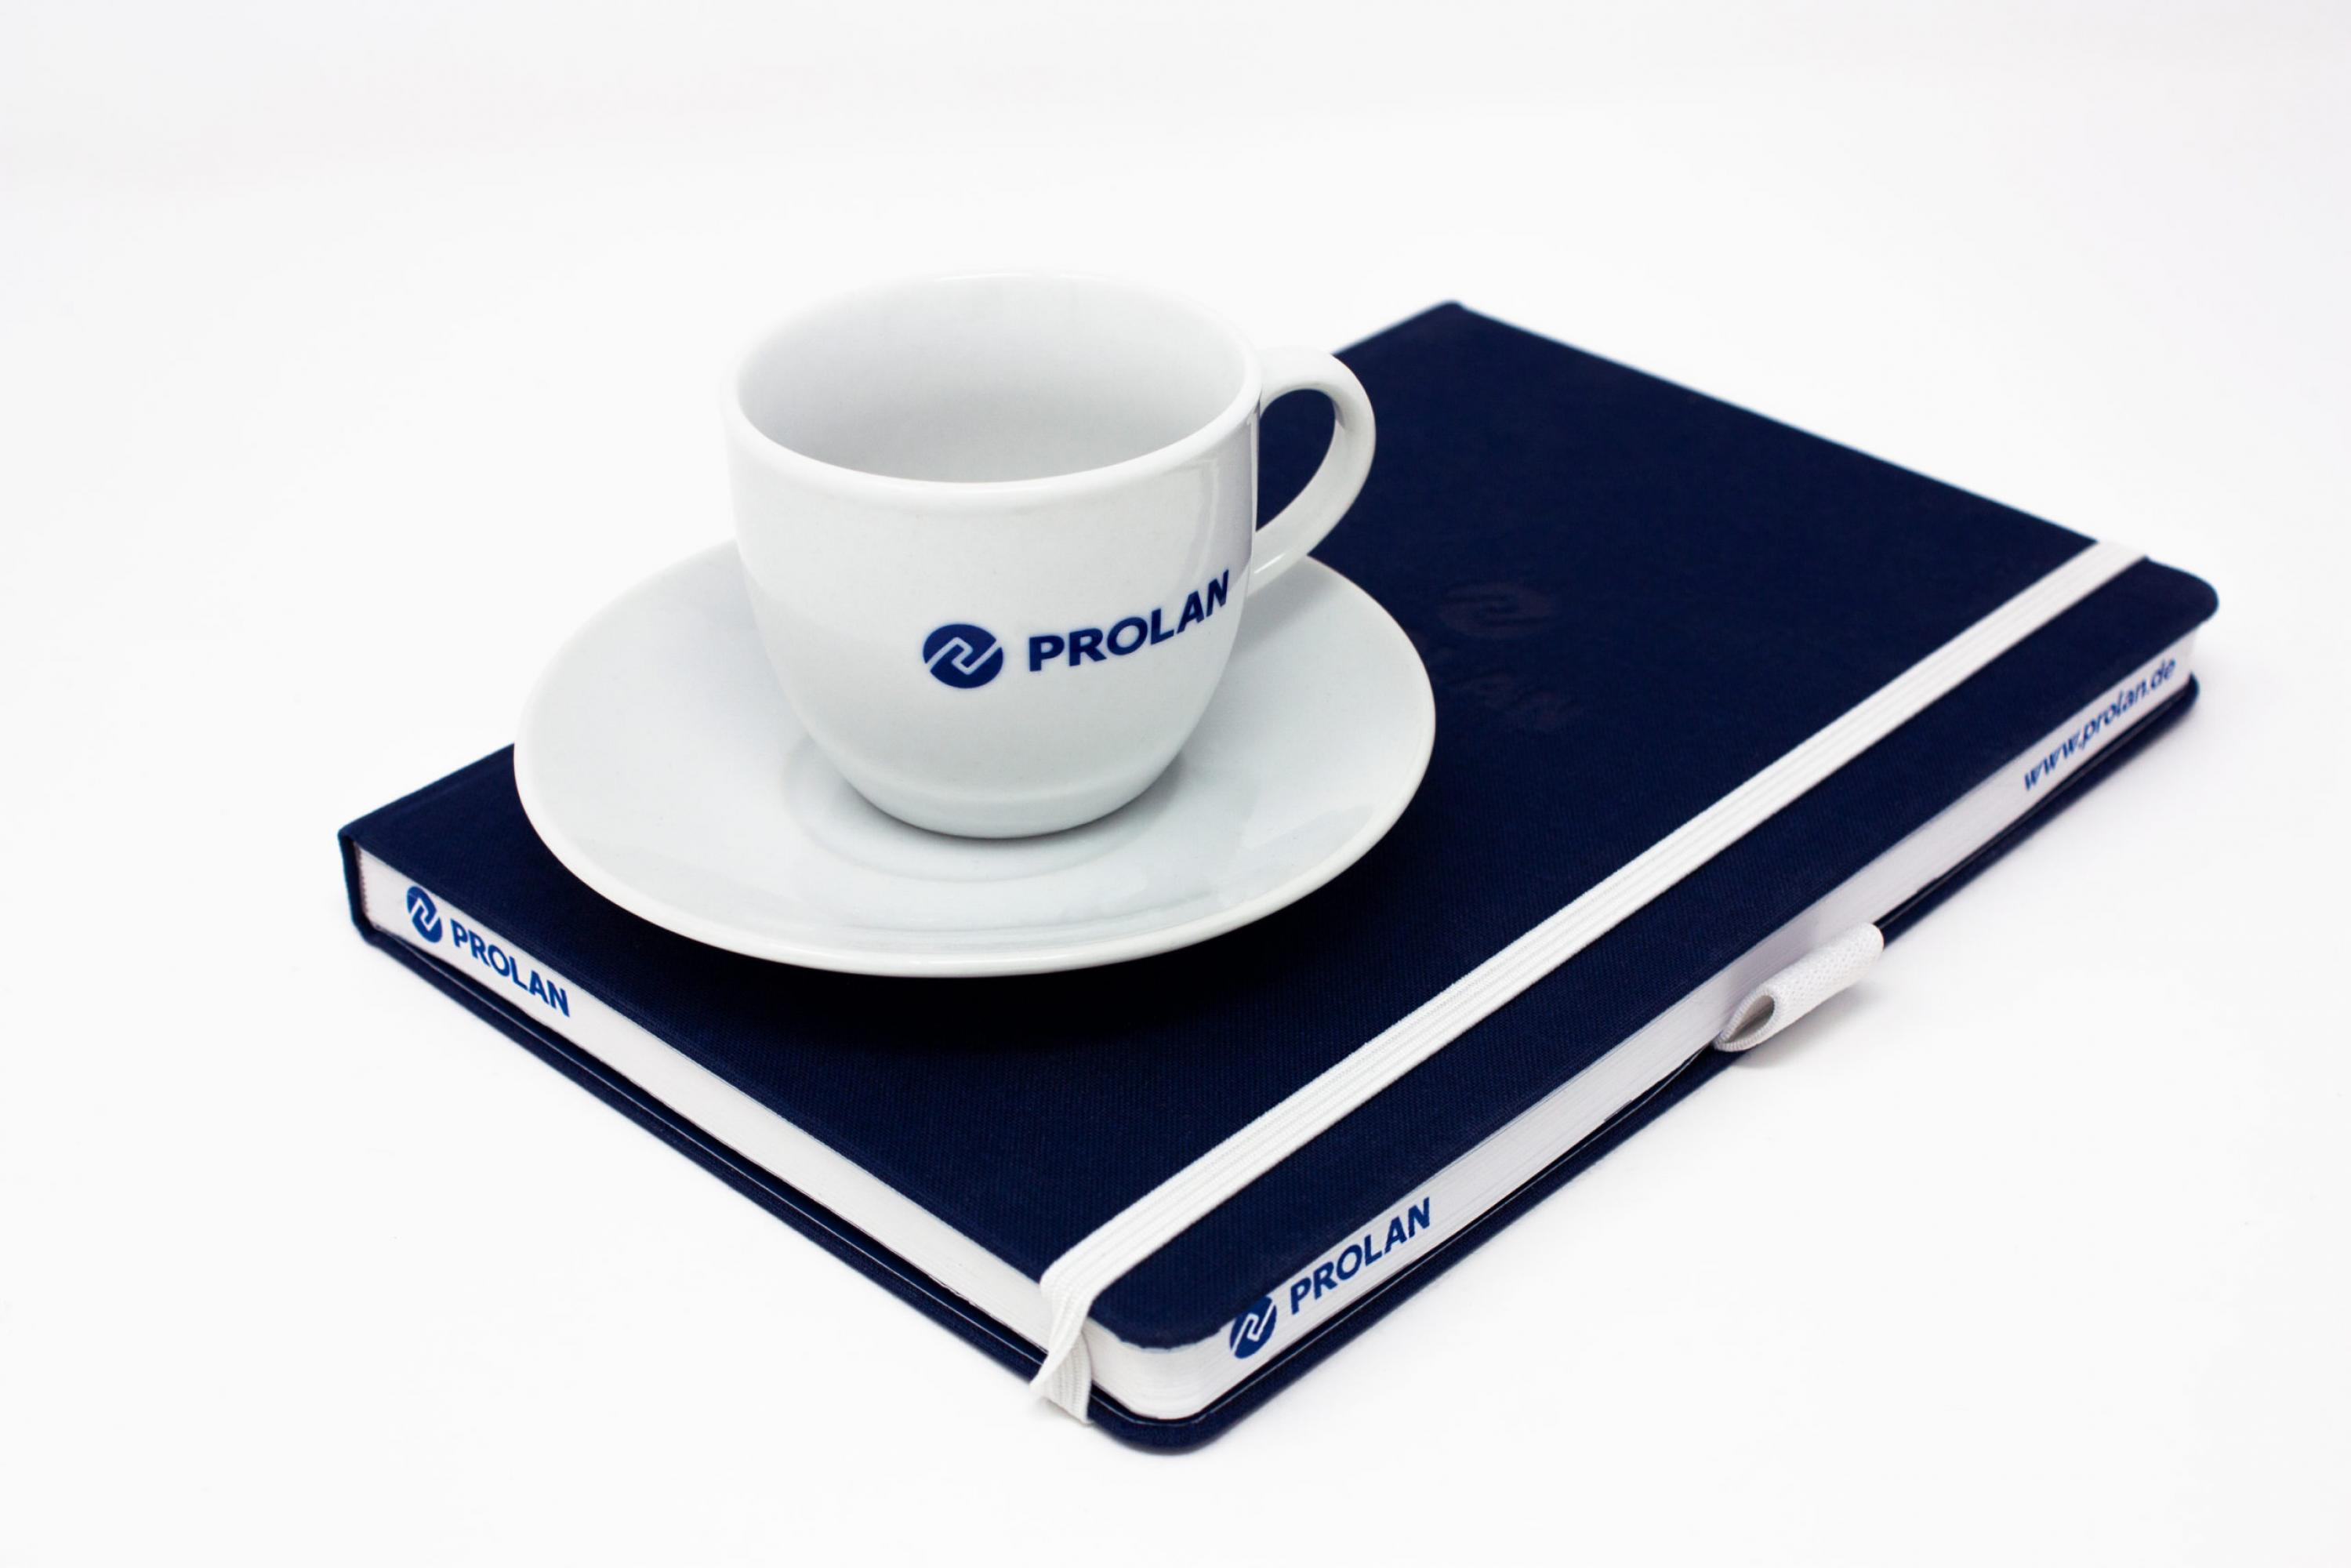 PROLAN-Espressotasse_MG_7392